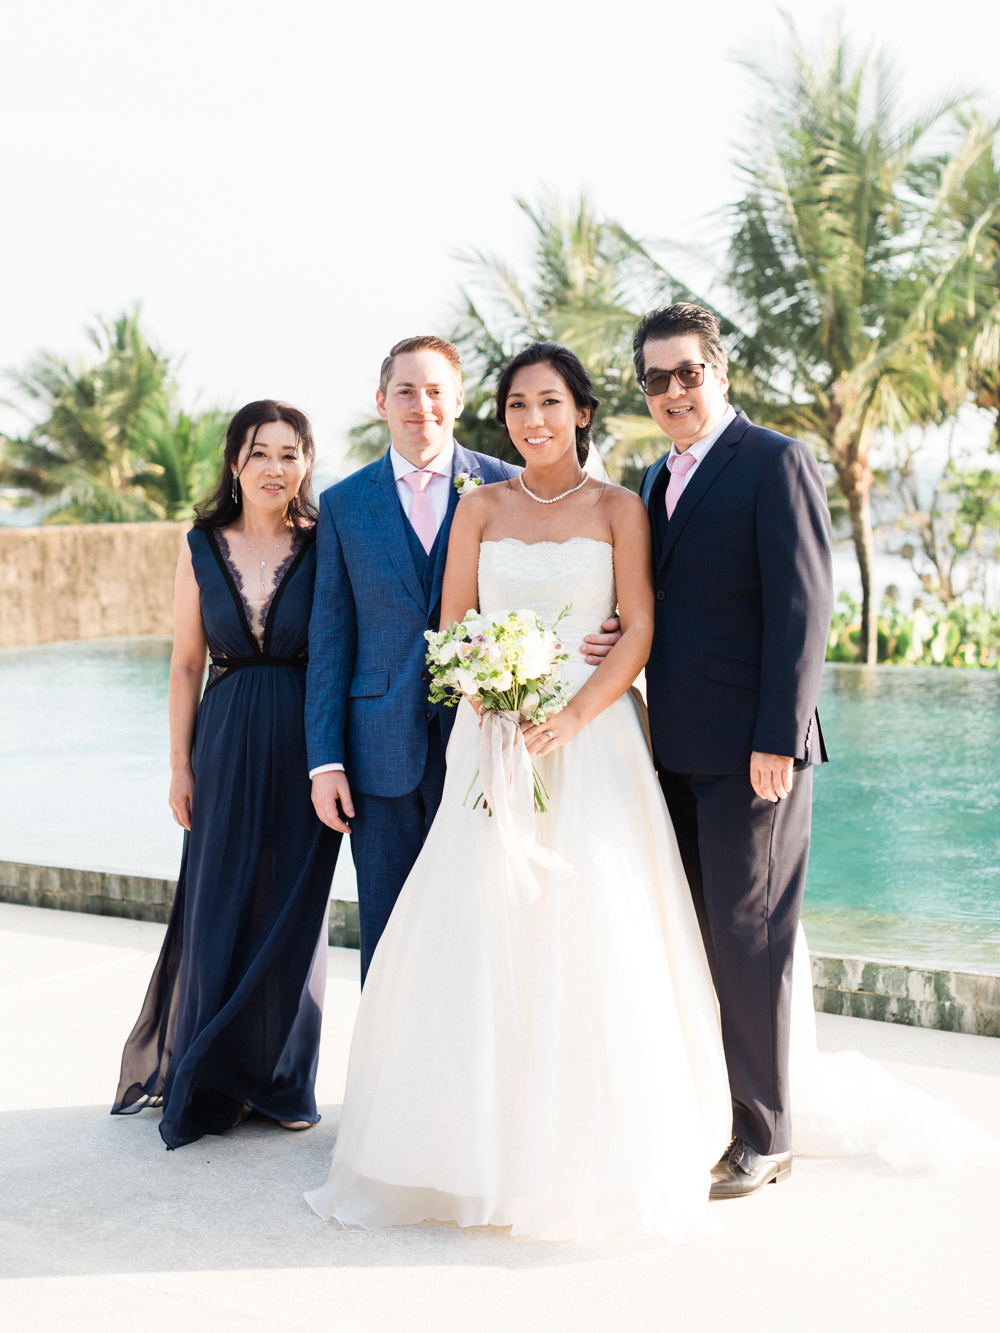 Bali_Real_Wedding_(c)_Rory_Wylie-84.jpg